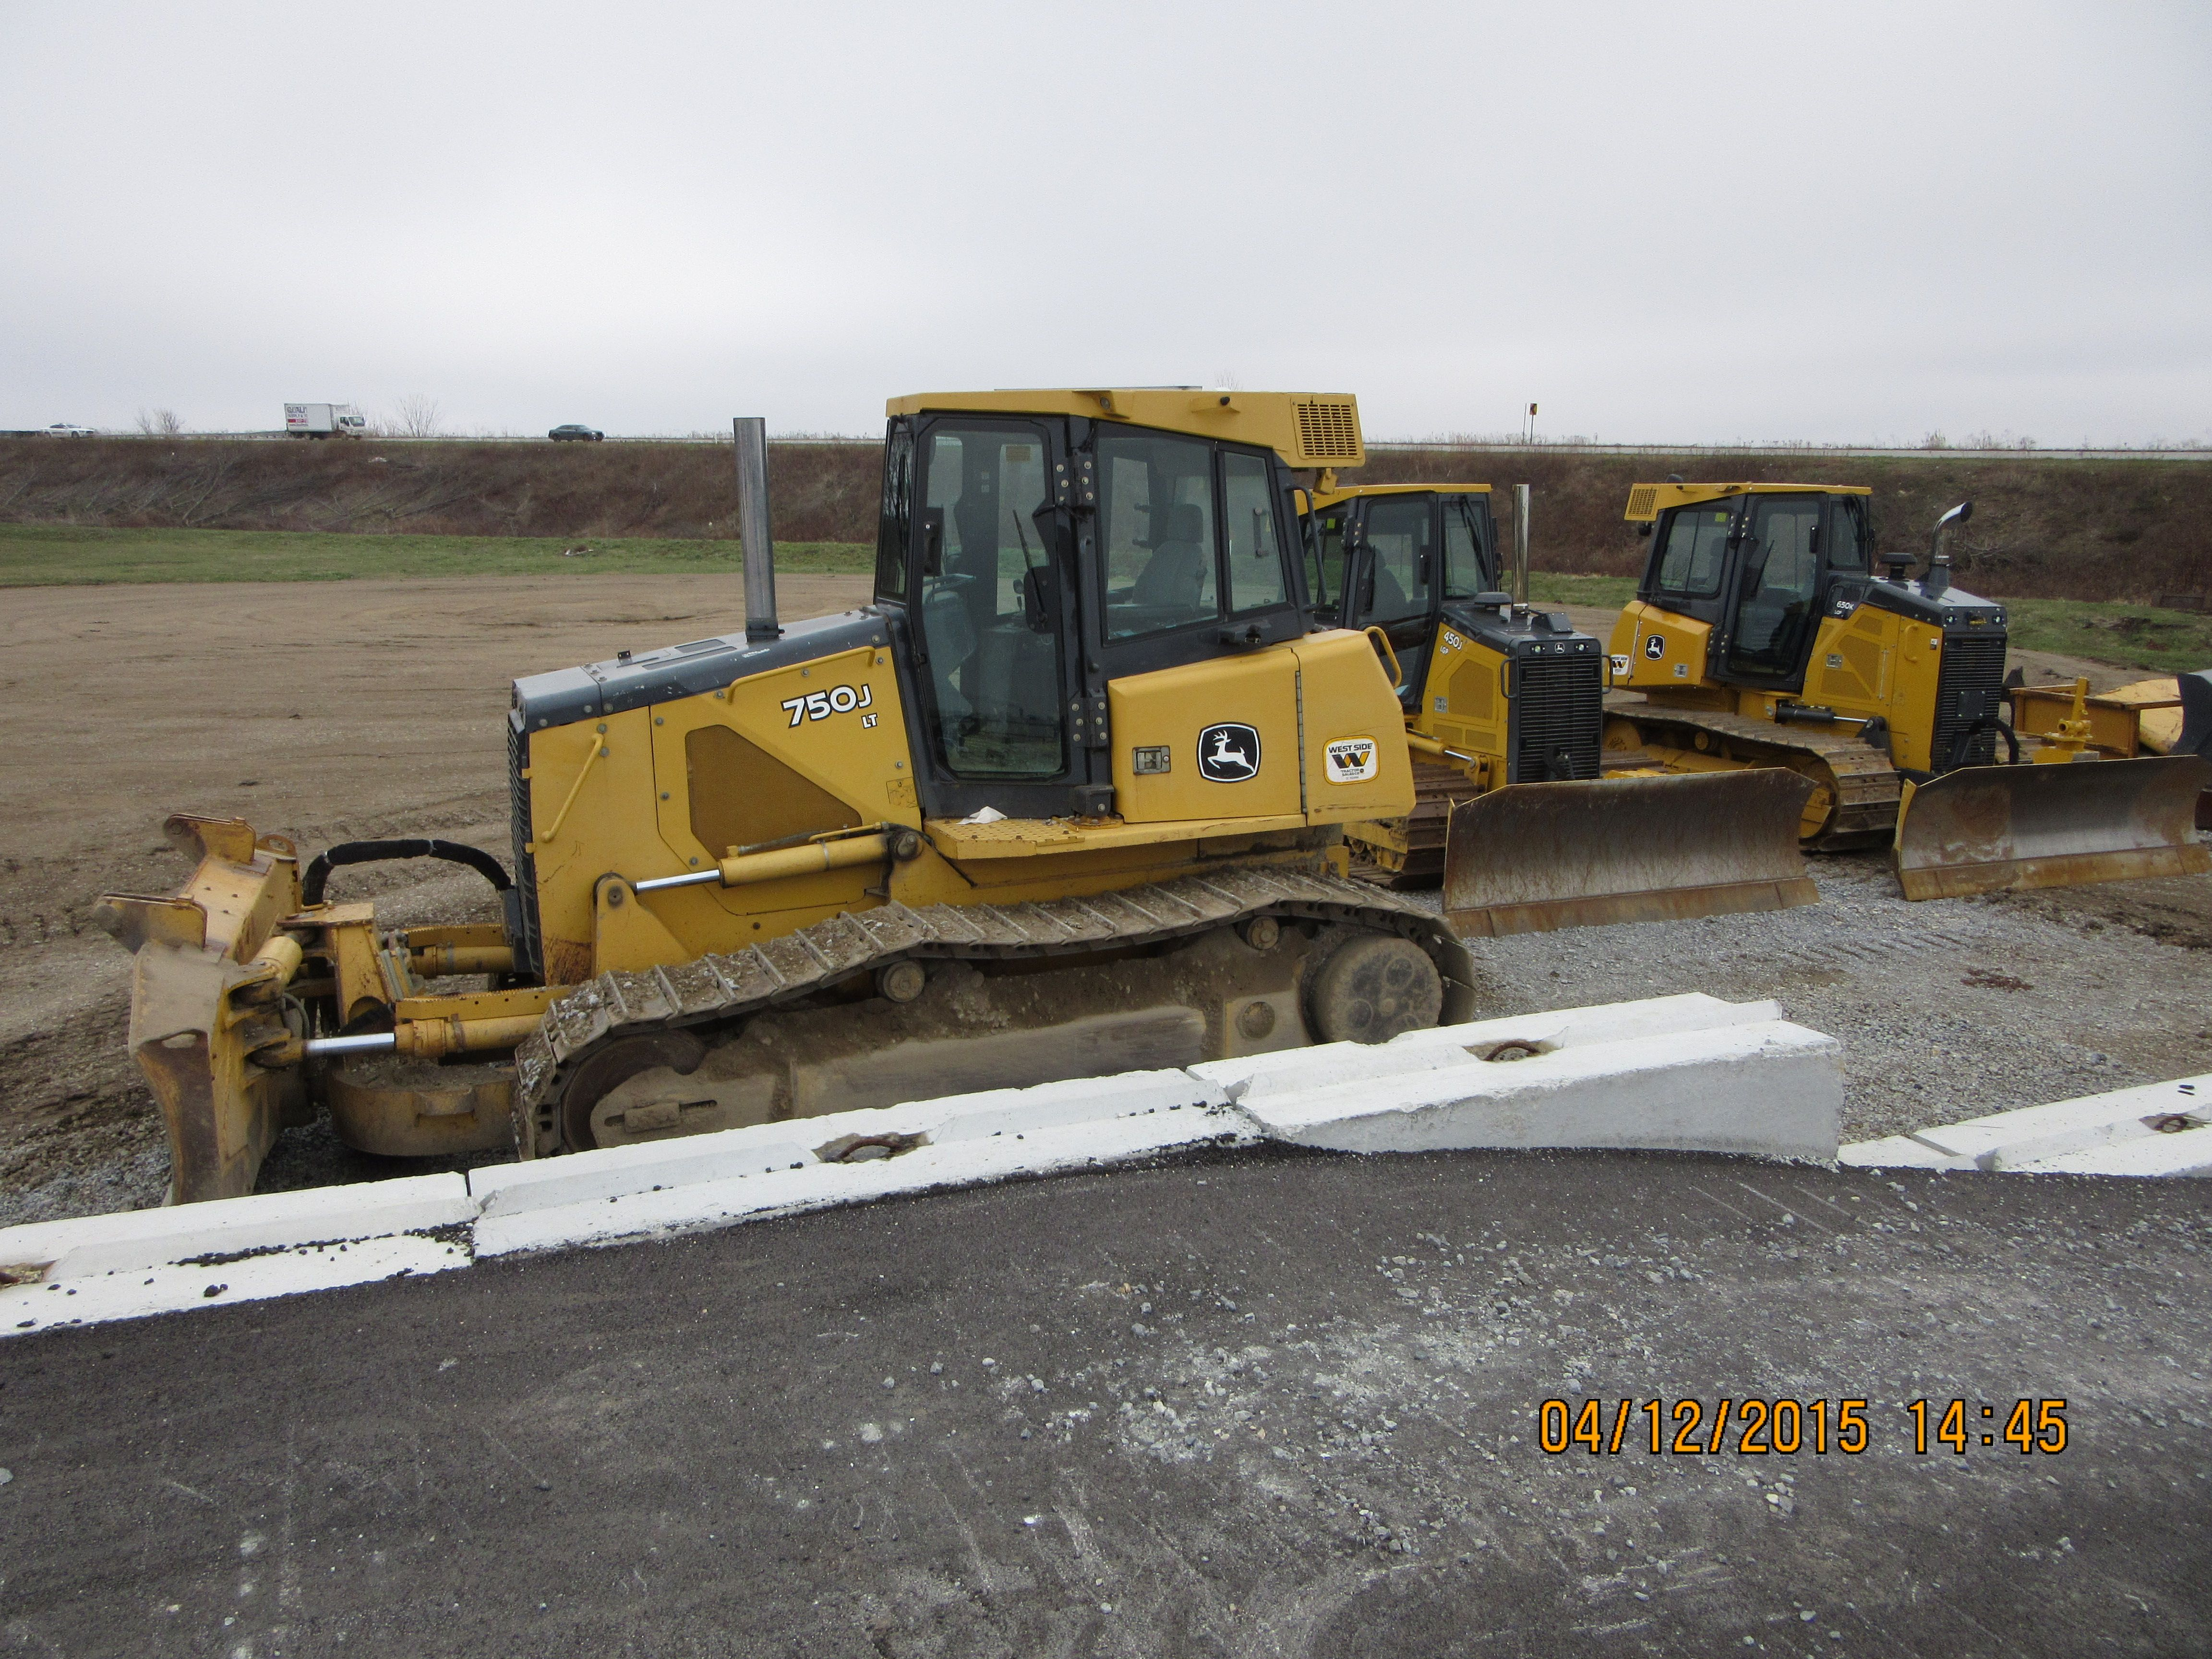 John Deere bulldozers from r-l:650K,450J,750J from loading dock